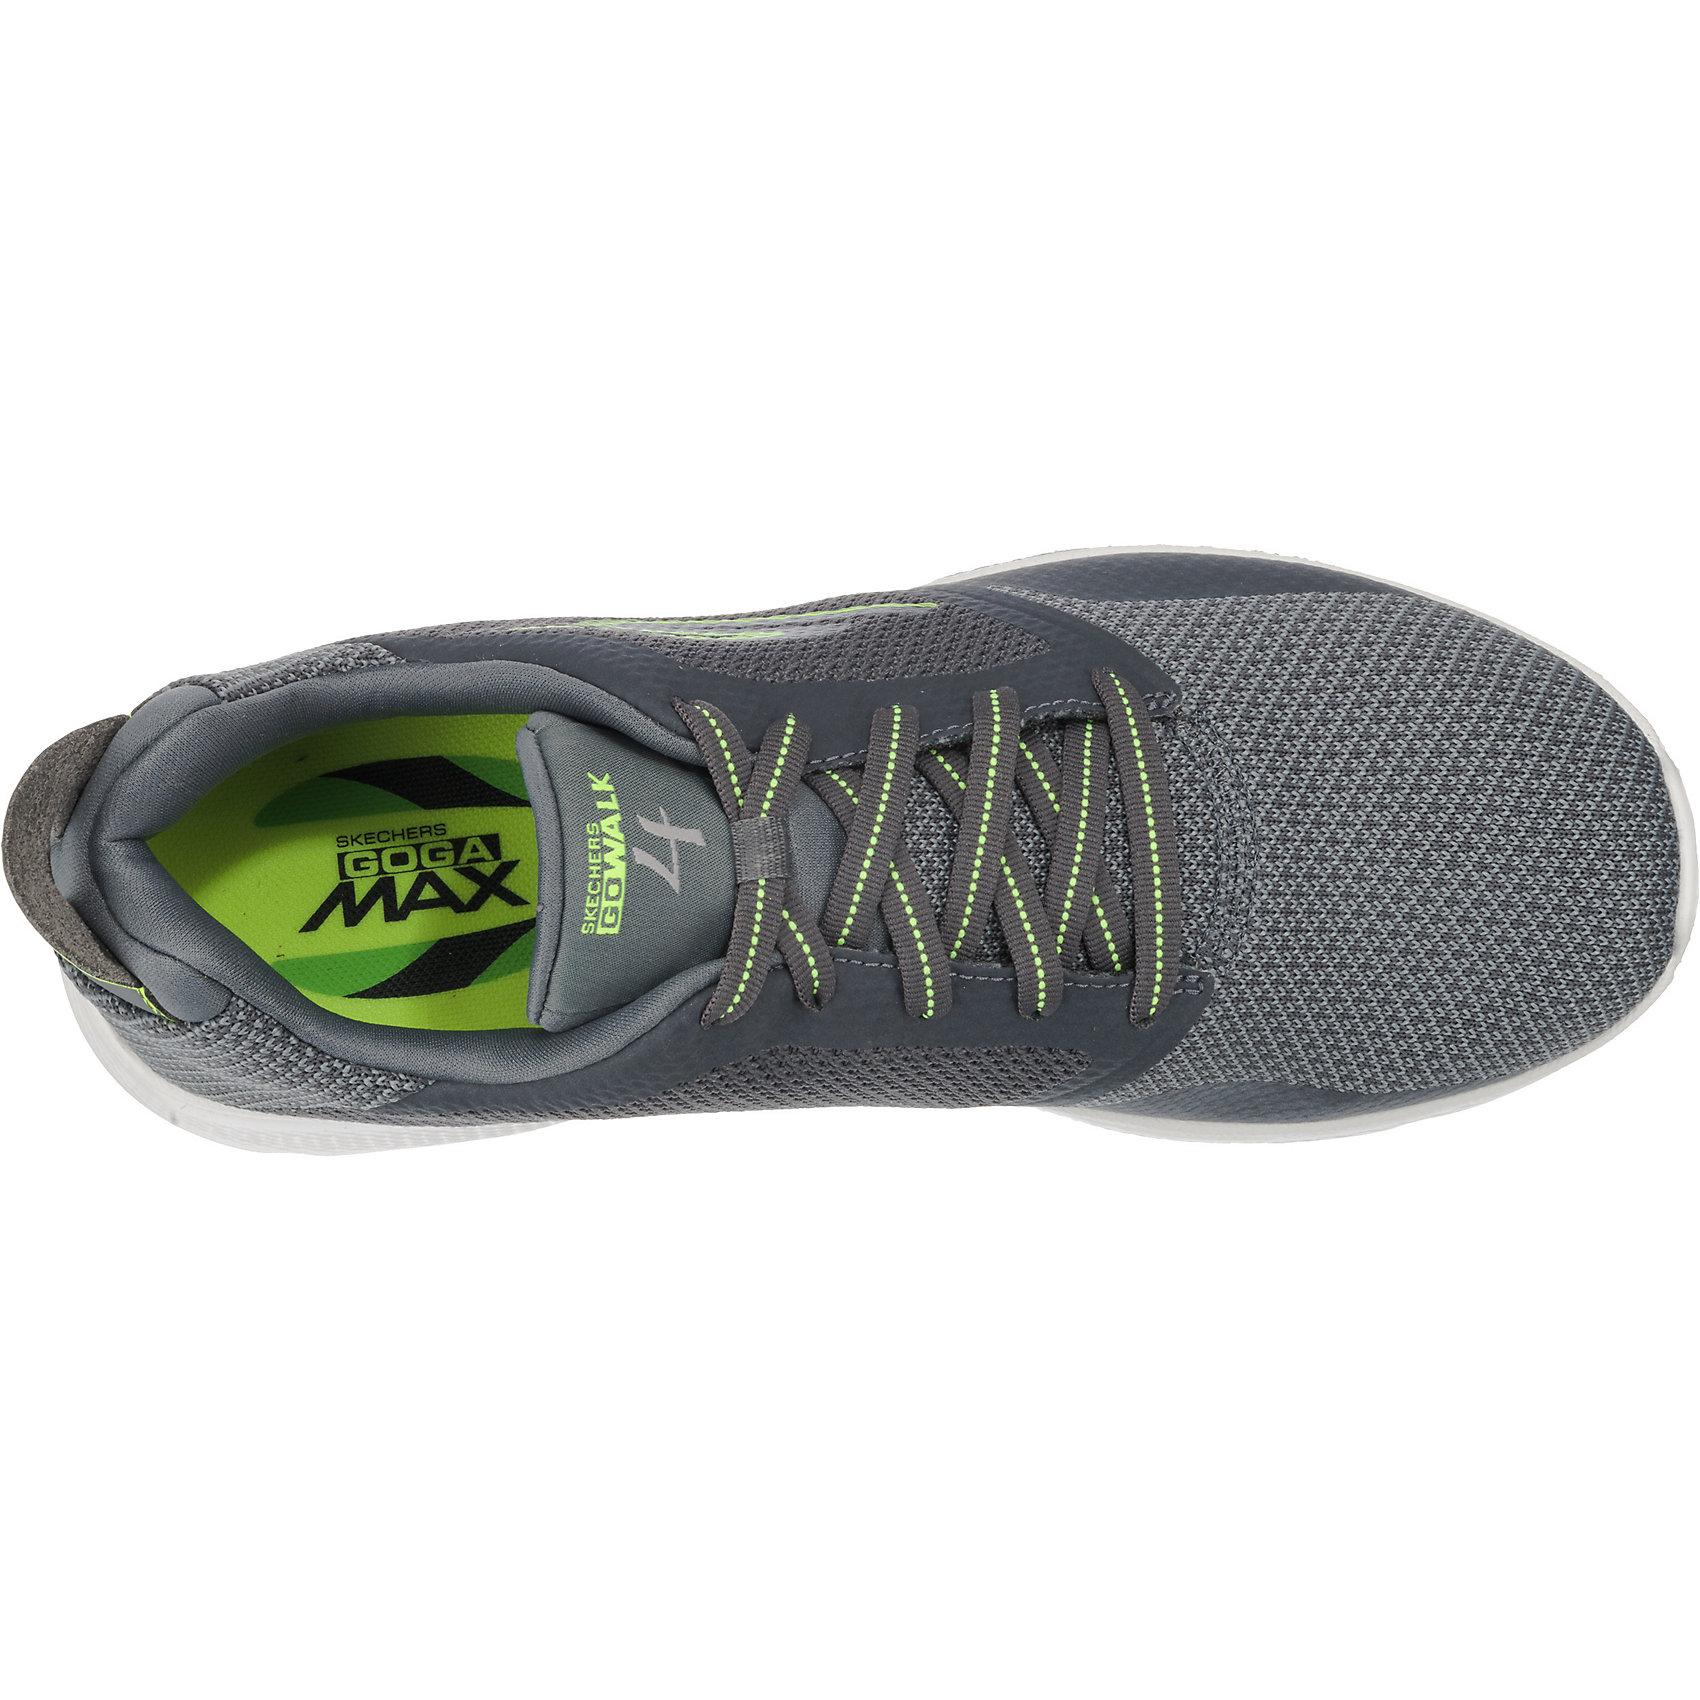 Details zu Neu SKECHERS Go Walk 4 Sneakers Low 7385206 für Herren schwarz